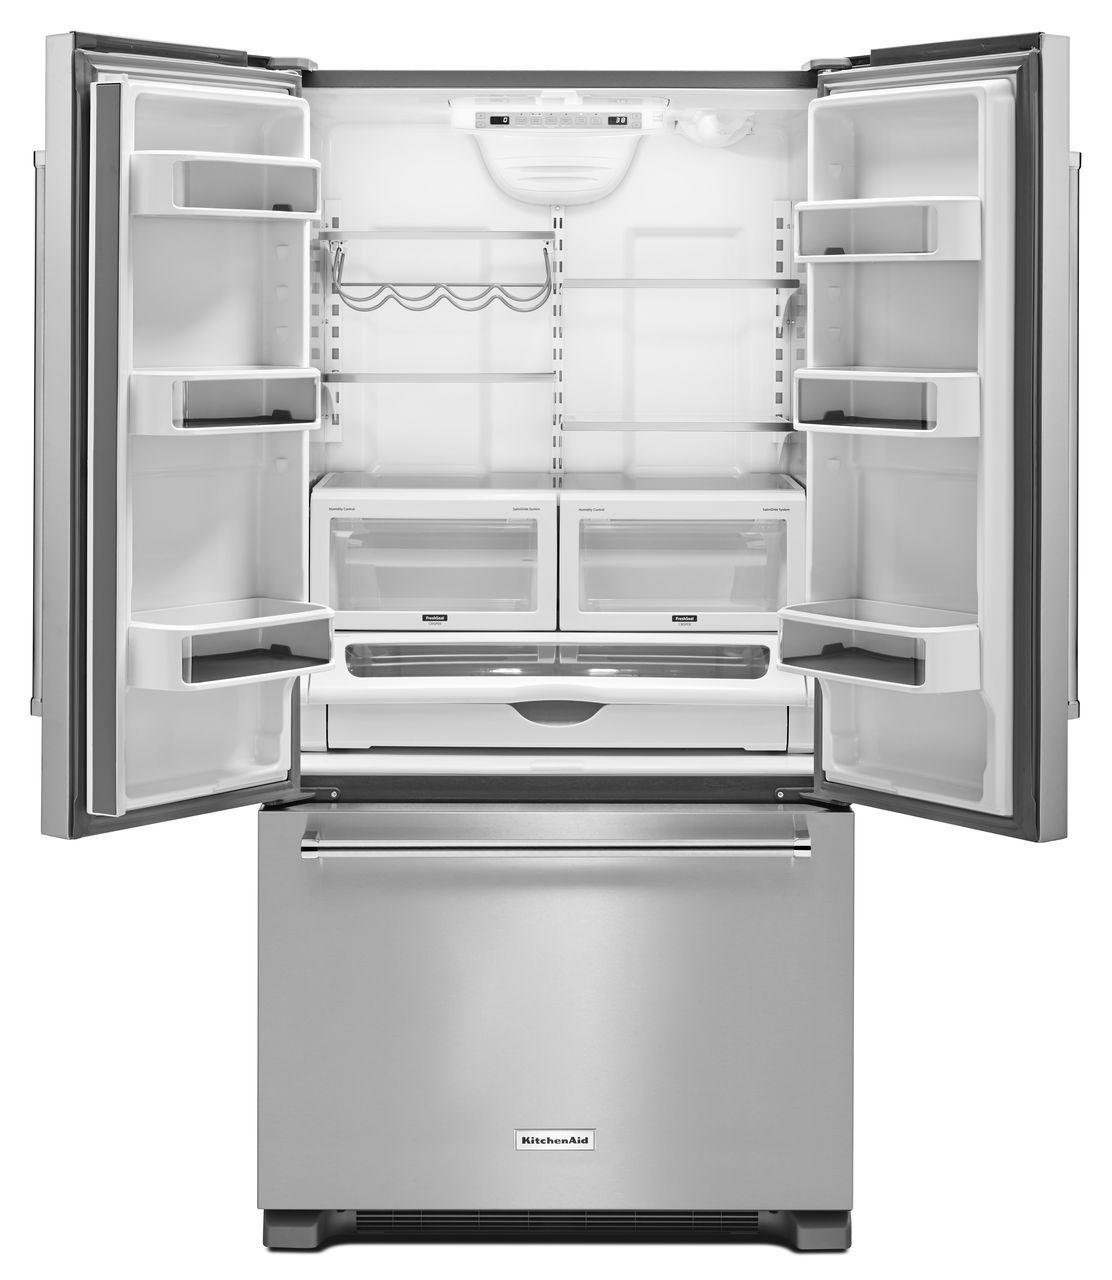 Kitchenaid cabinet depth refrigerator - Main Image 1